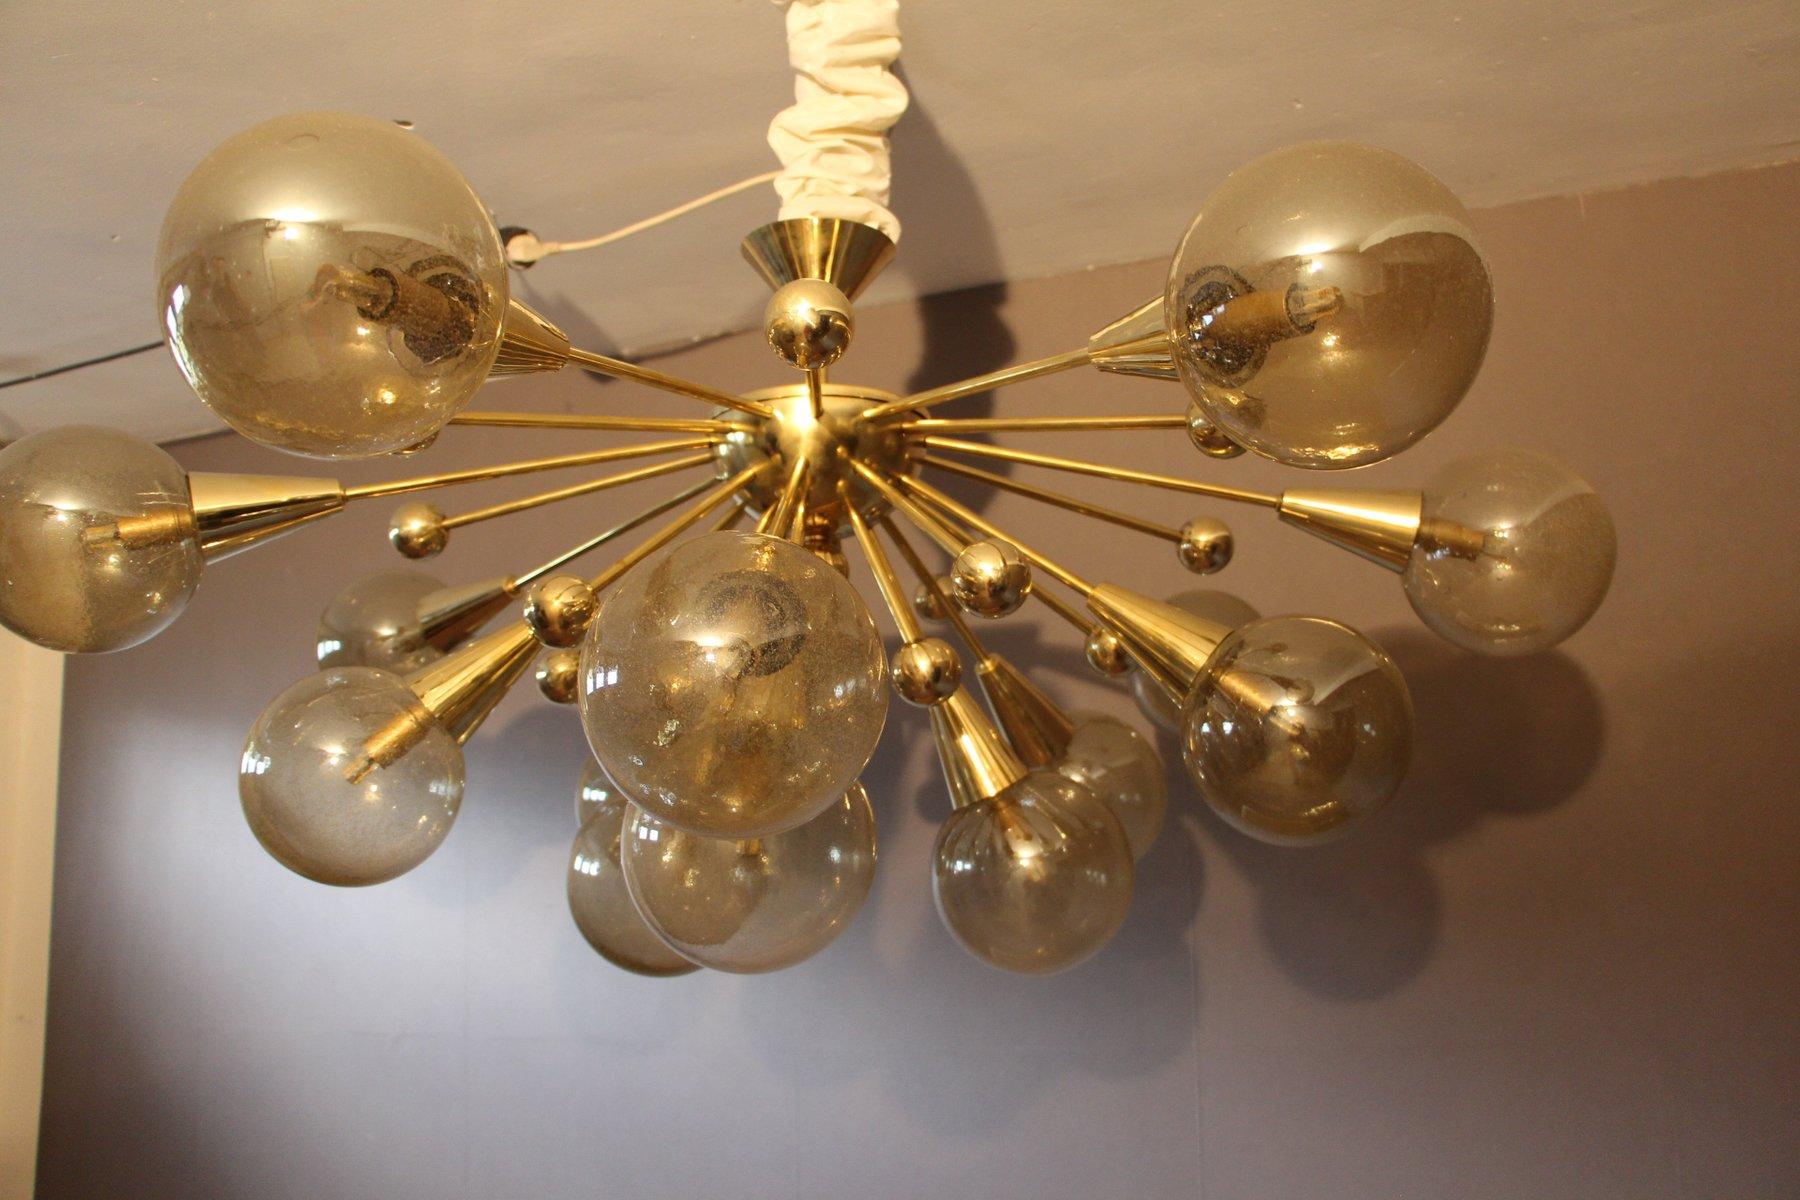 Vintage gold semi sputnik ceiling light with murano glass for sale vintage gold semi sputnik ceiling light with murano glass mozeypictures Image collections